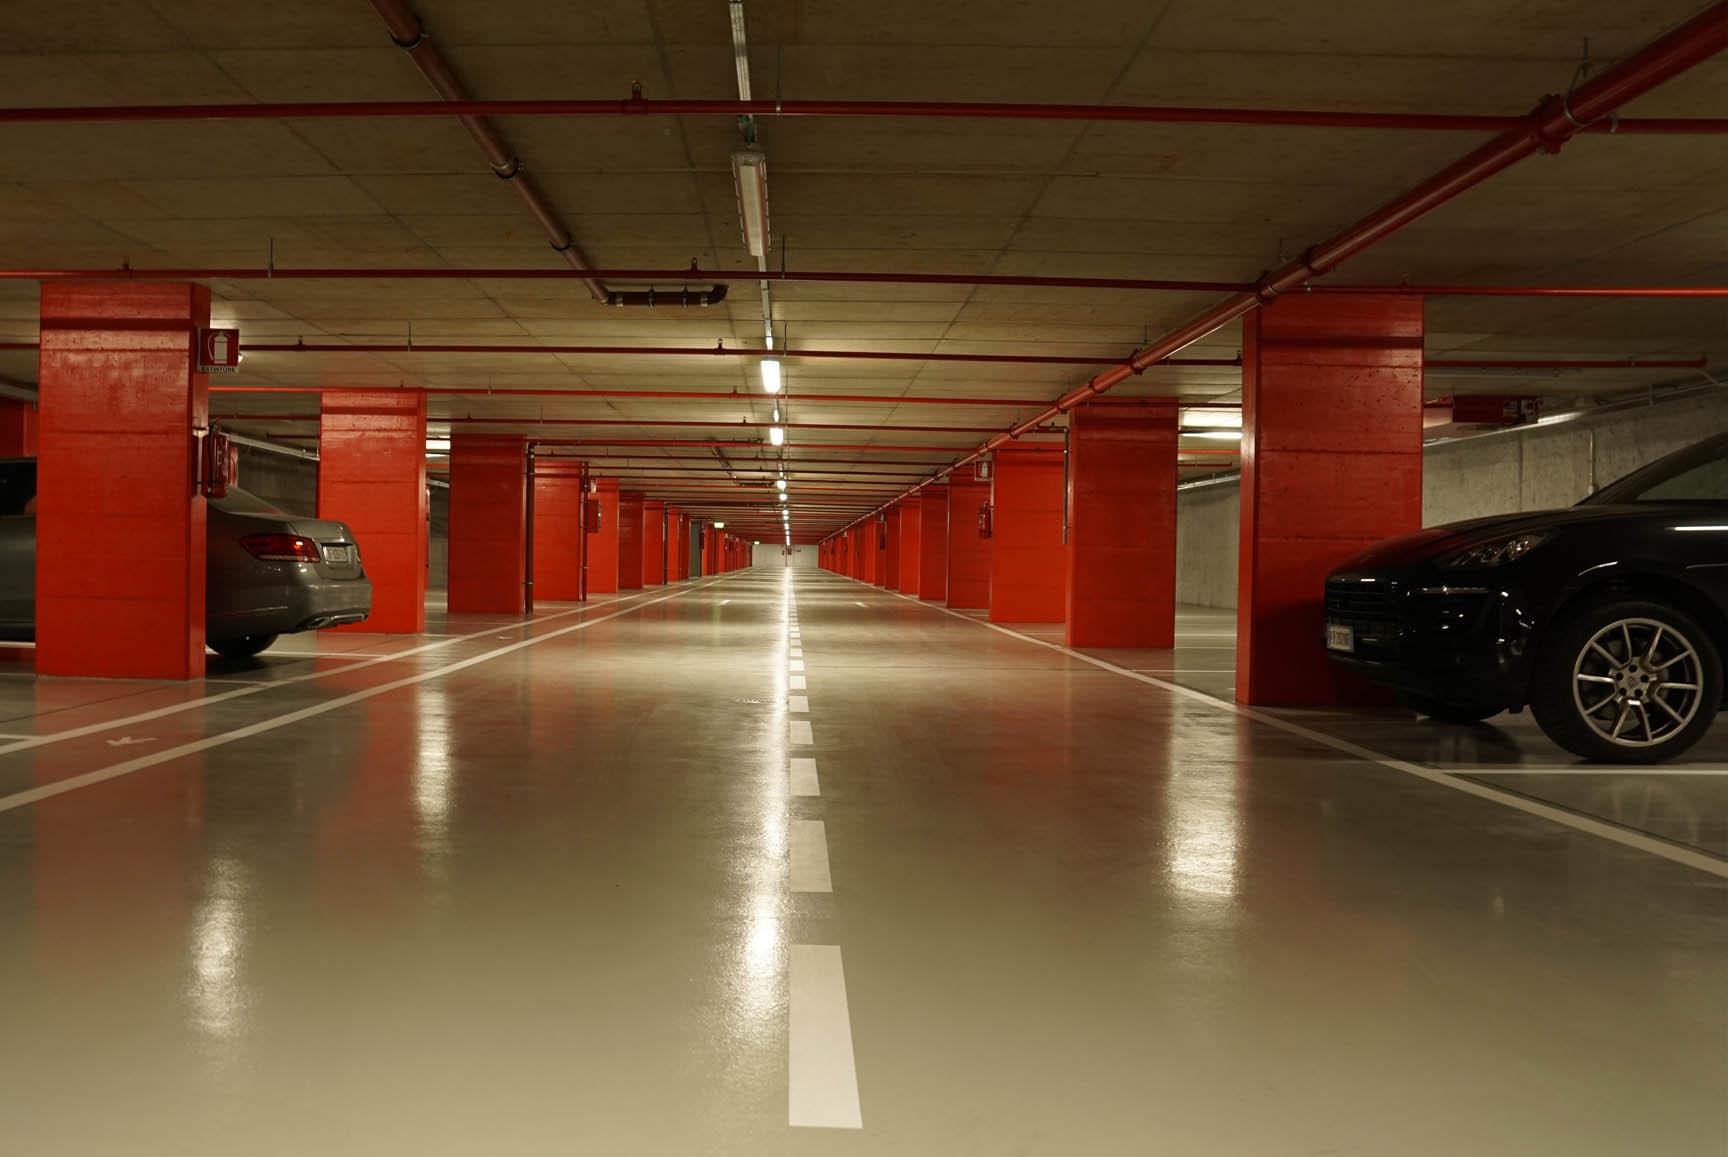 <h1><b>Sant&#8217;Ambrogio Parking</b> </h1>